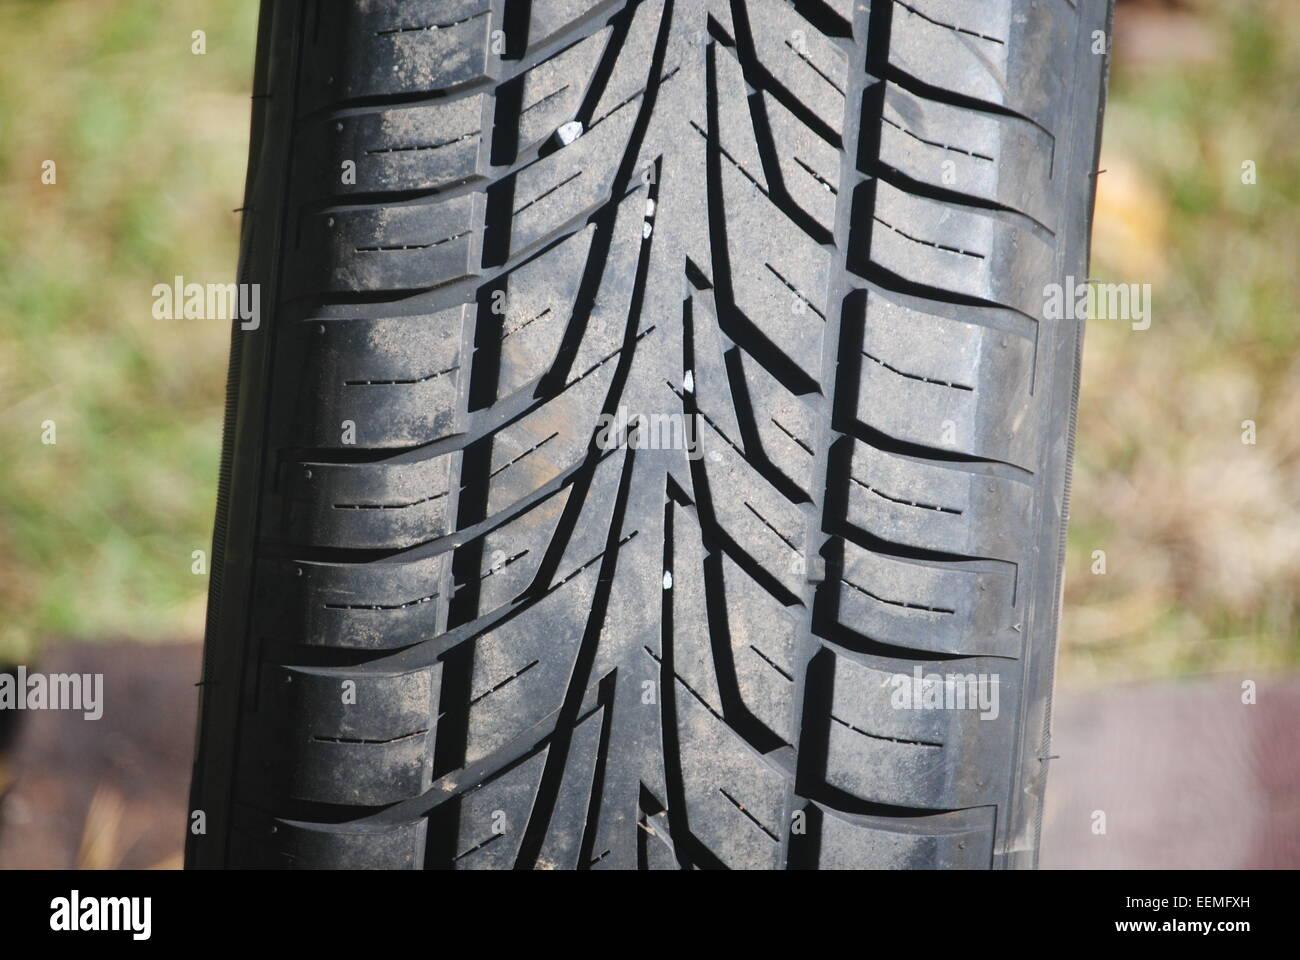 Automotive tire - Stock Image